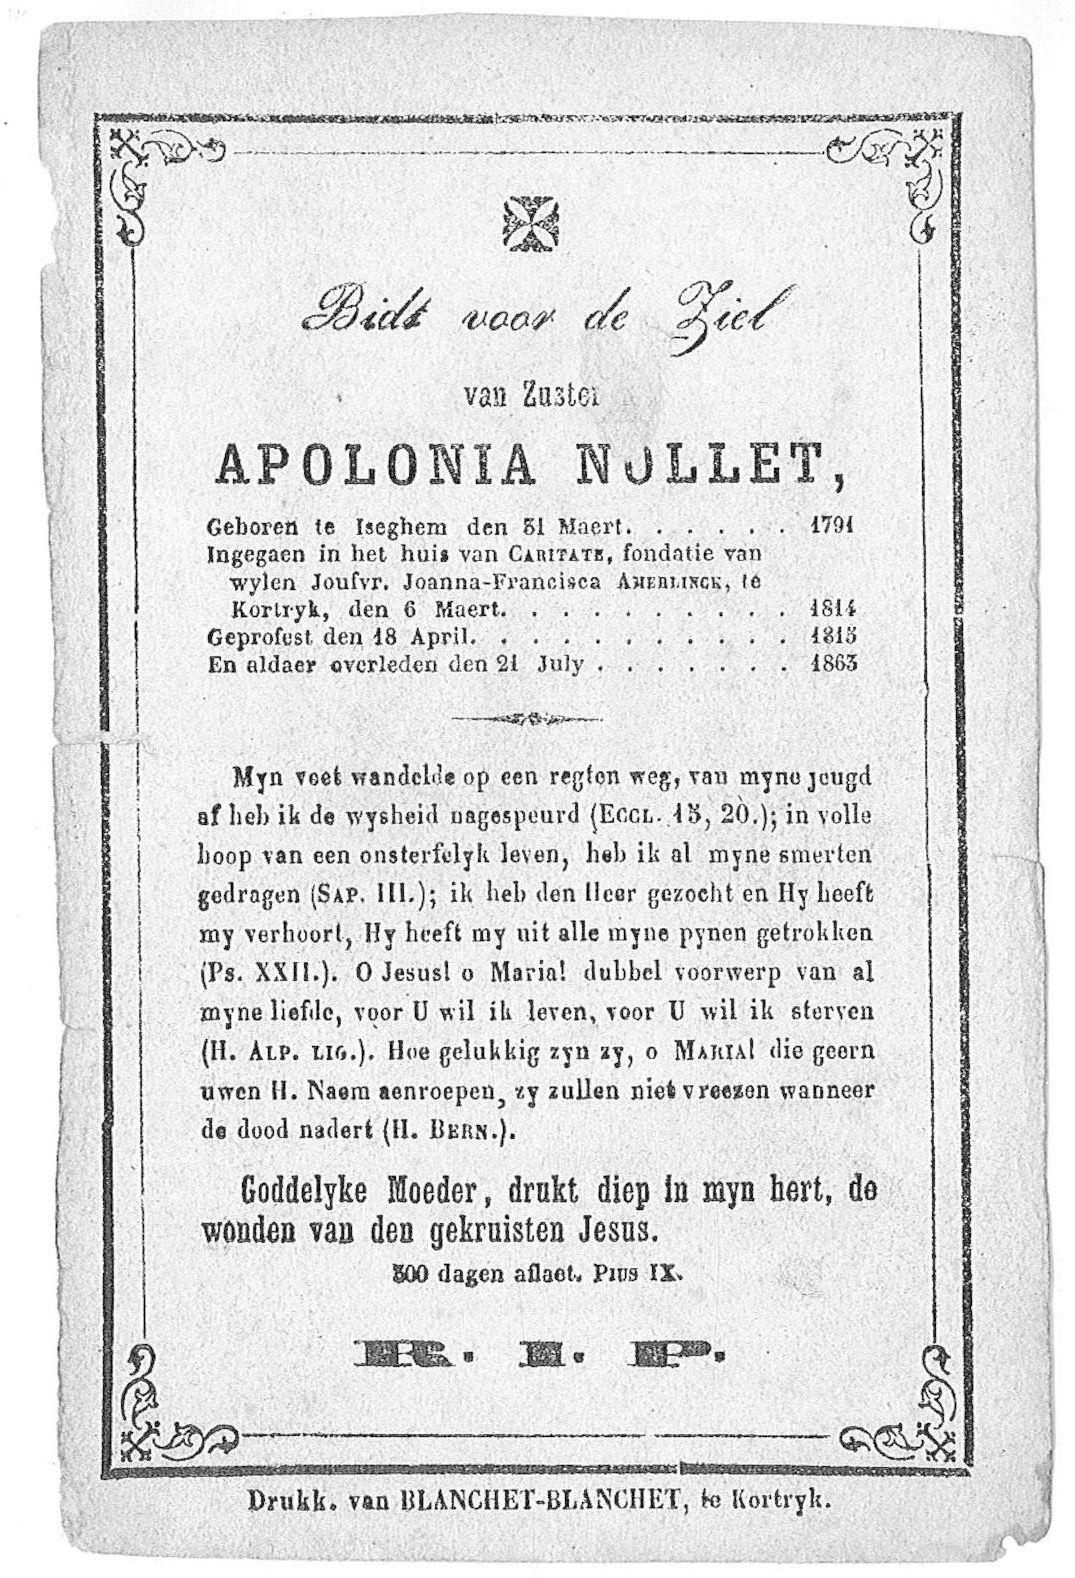 Apolonia Nollet